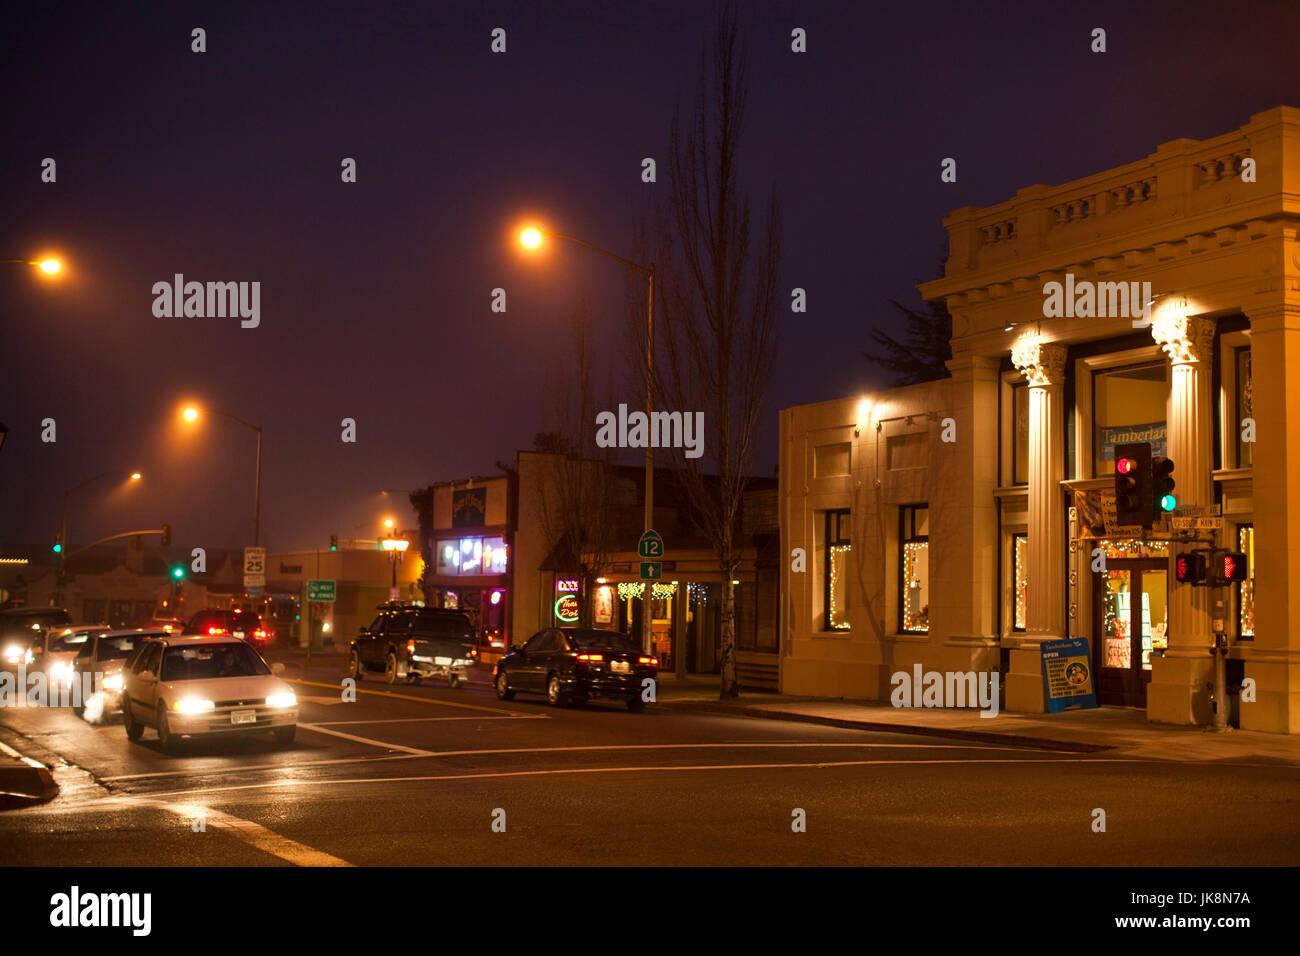 USA, California, Northern California, Russian River Wine Country, Sebastopol, downtown in fog, evening - Stock Image